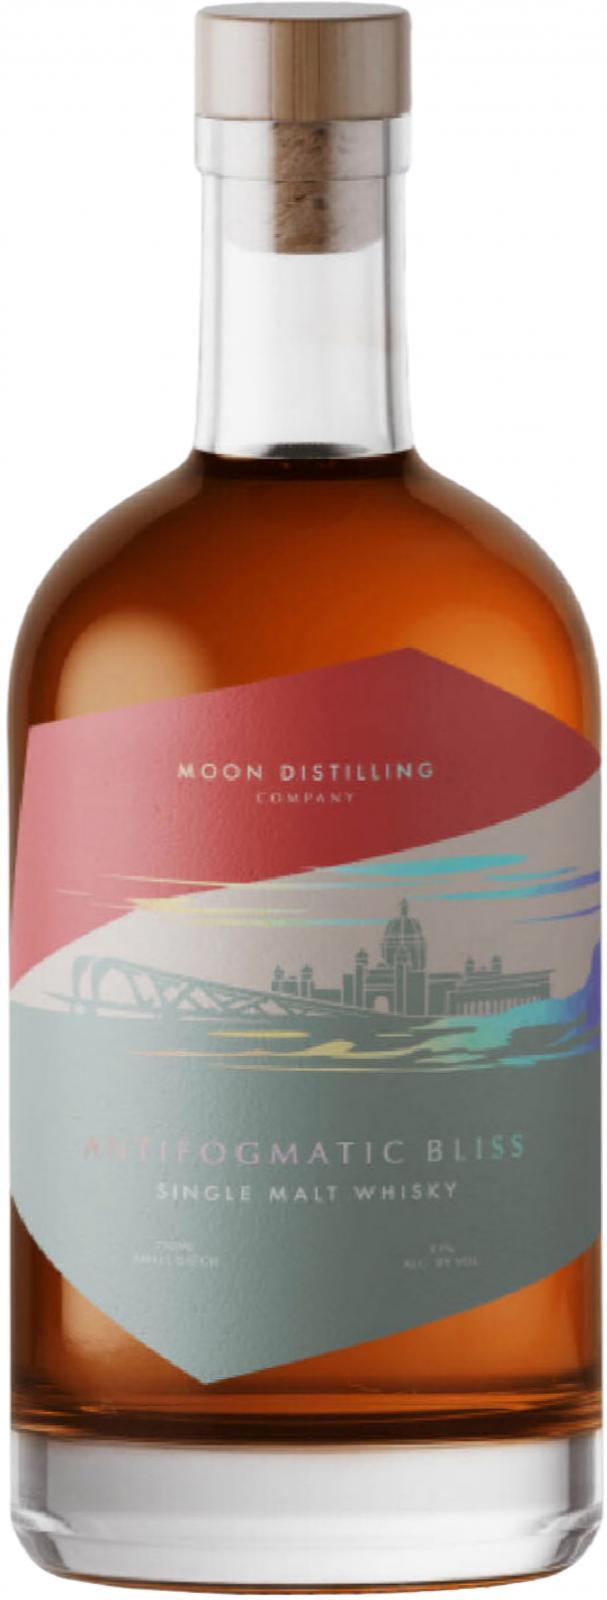 Moon Distilling Antifogmatic Bliss